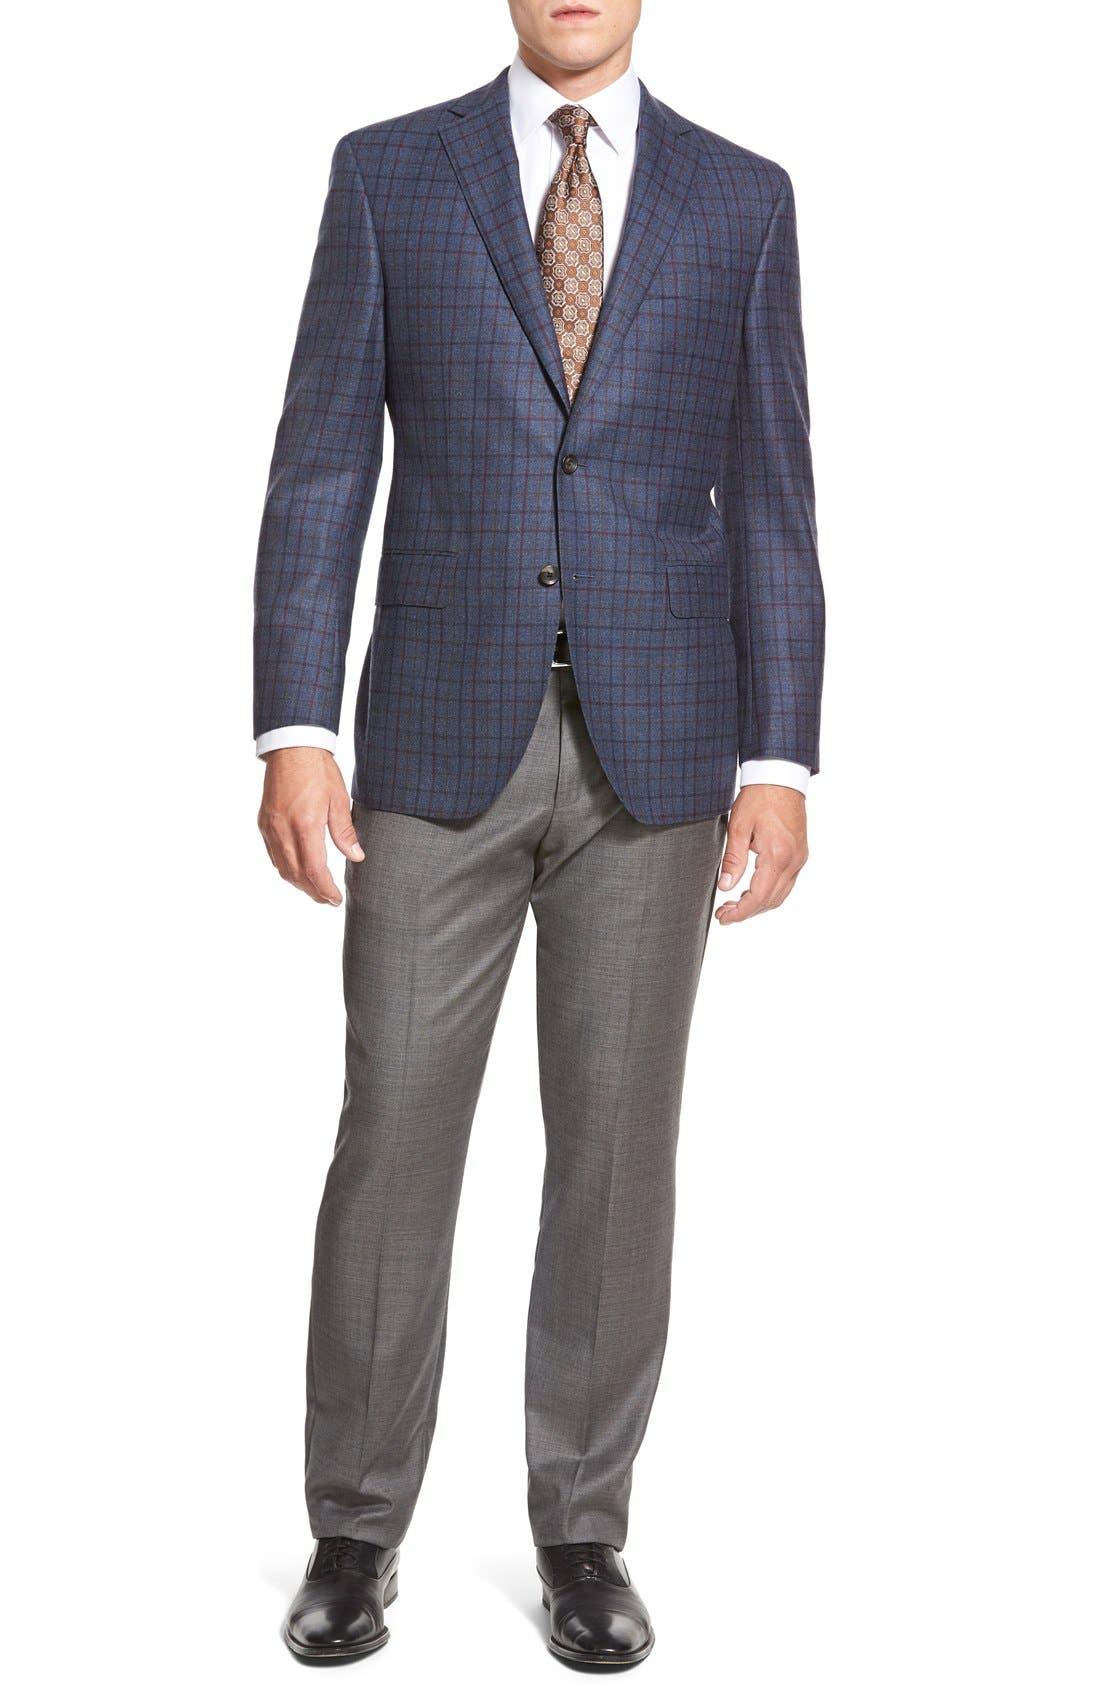 ZZDNUHUGO BOSS,                             BOSS HUGO BOSS 'Sharp' Flat Front Wool Trousers,                             Alternate thumbnail 3, color,                             001